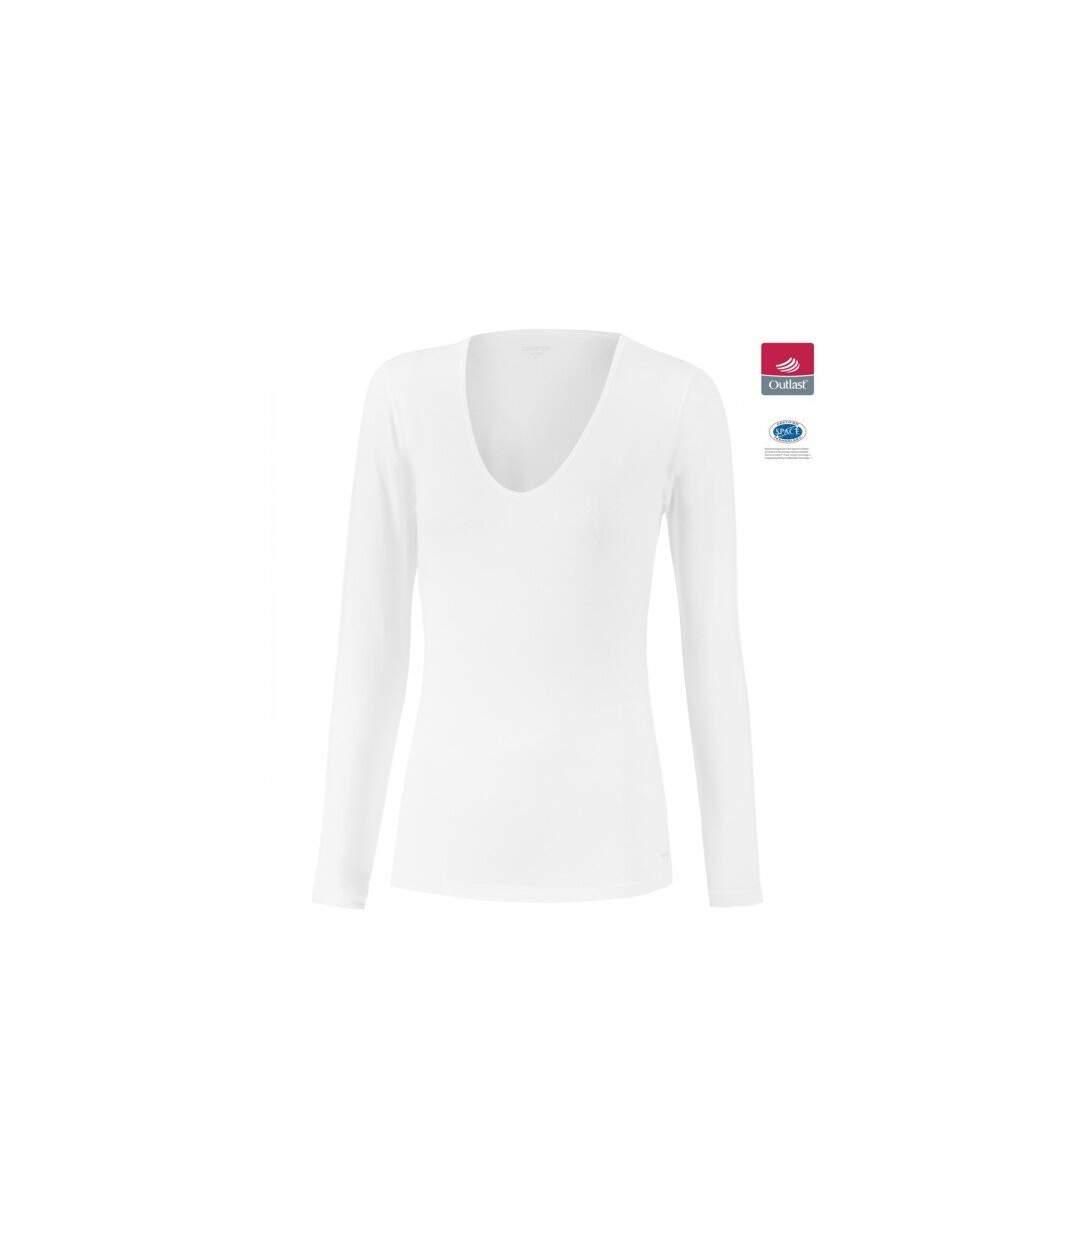 IMPETUS T-shirt Manches longues Col V Femme Coton Viscose INNOVATION Blanc